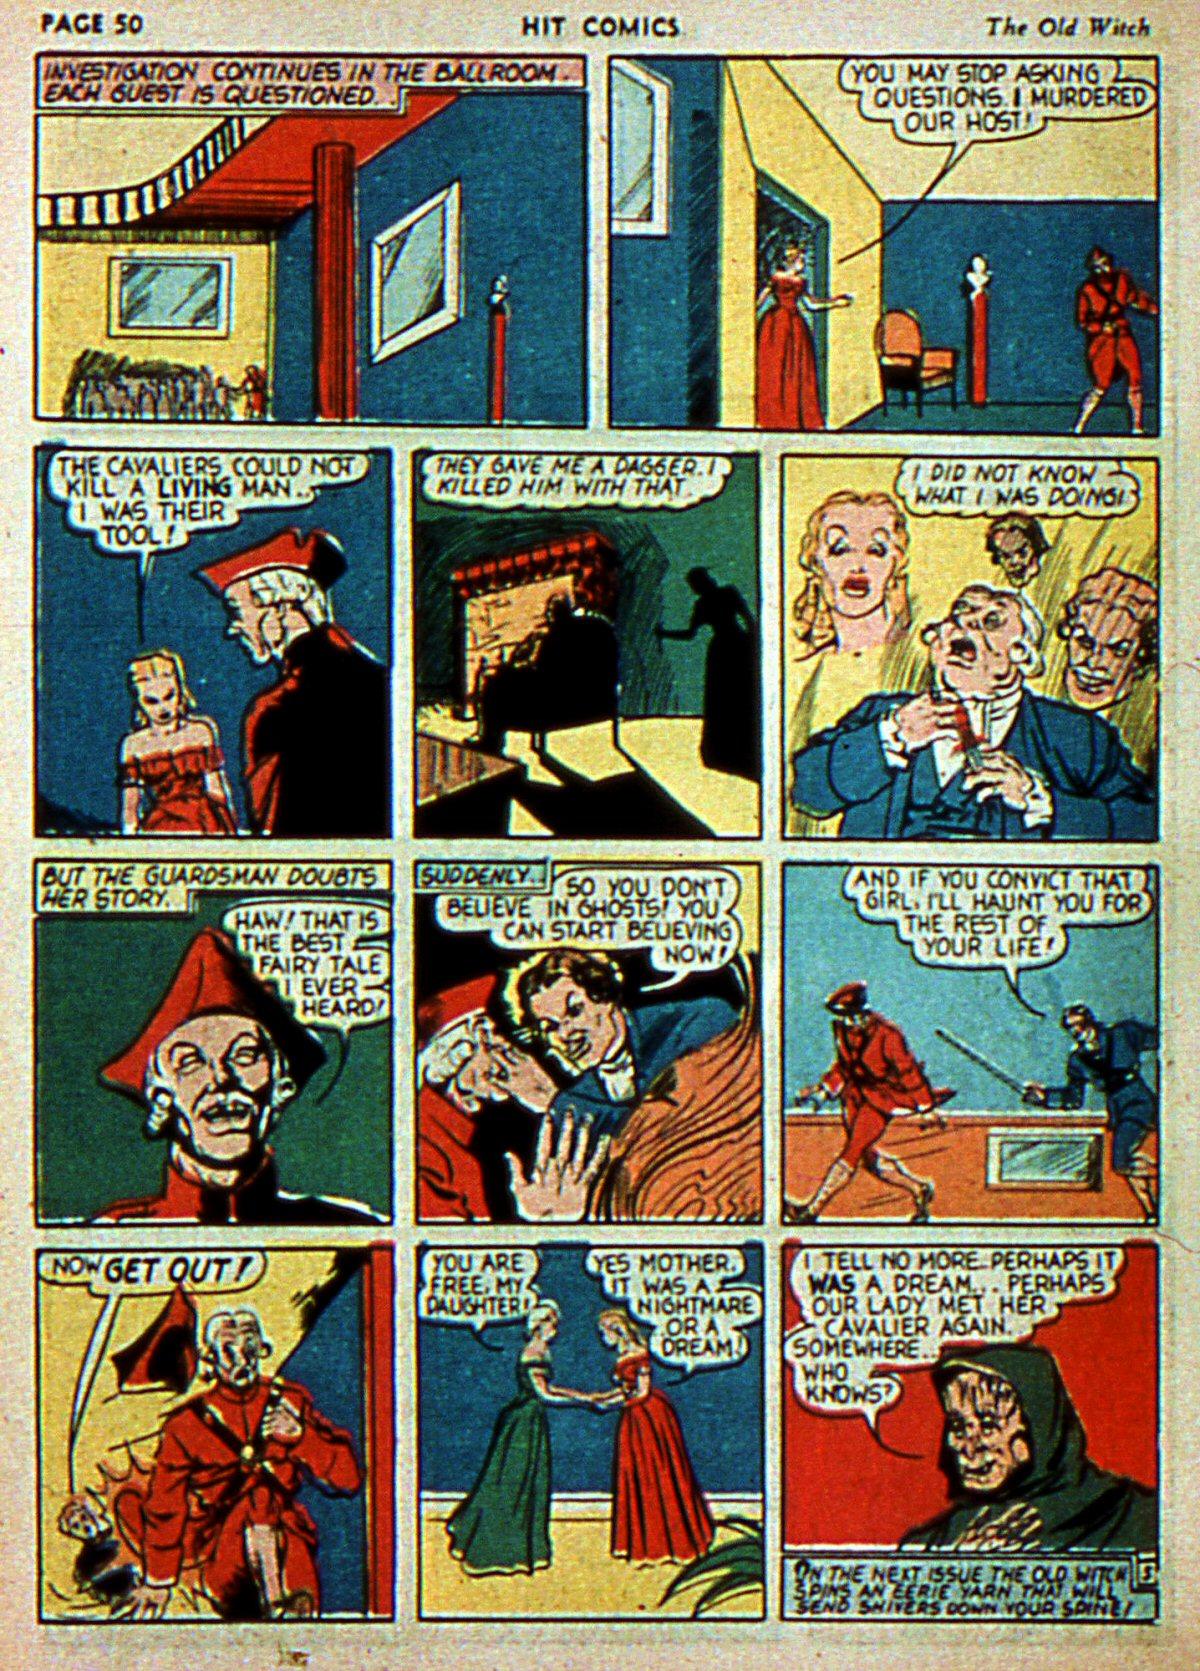 Read online Hit Comics comic -  Issue #3 - 52